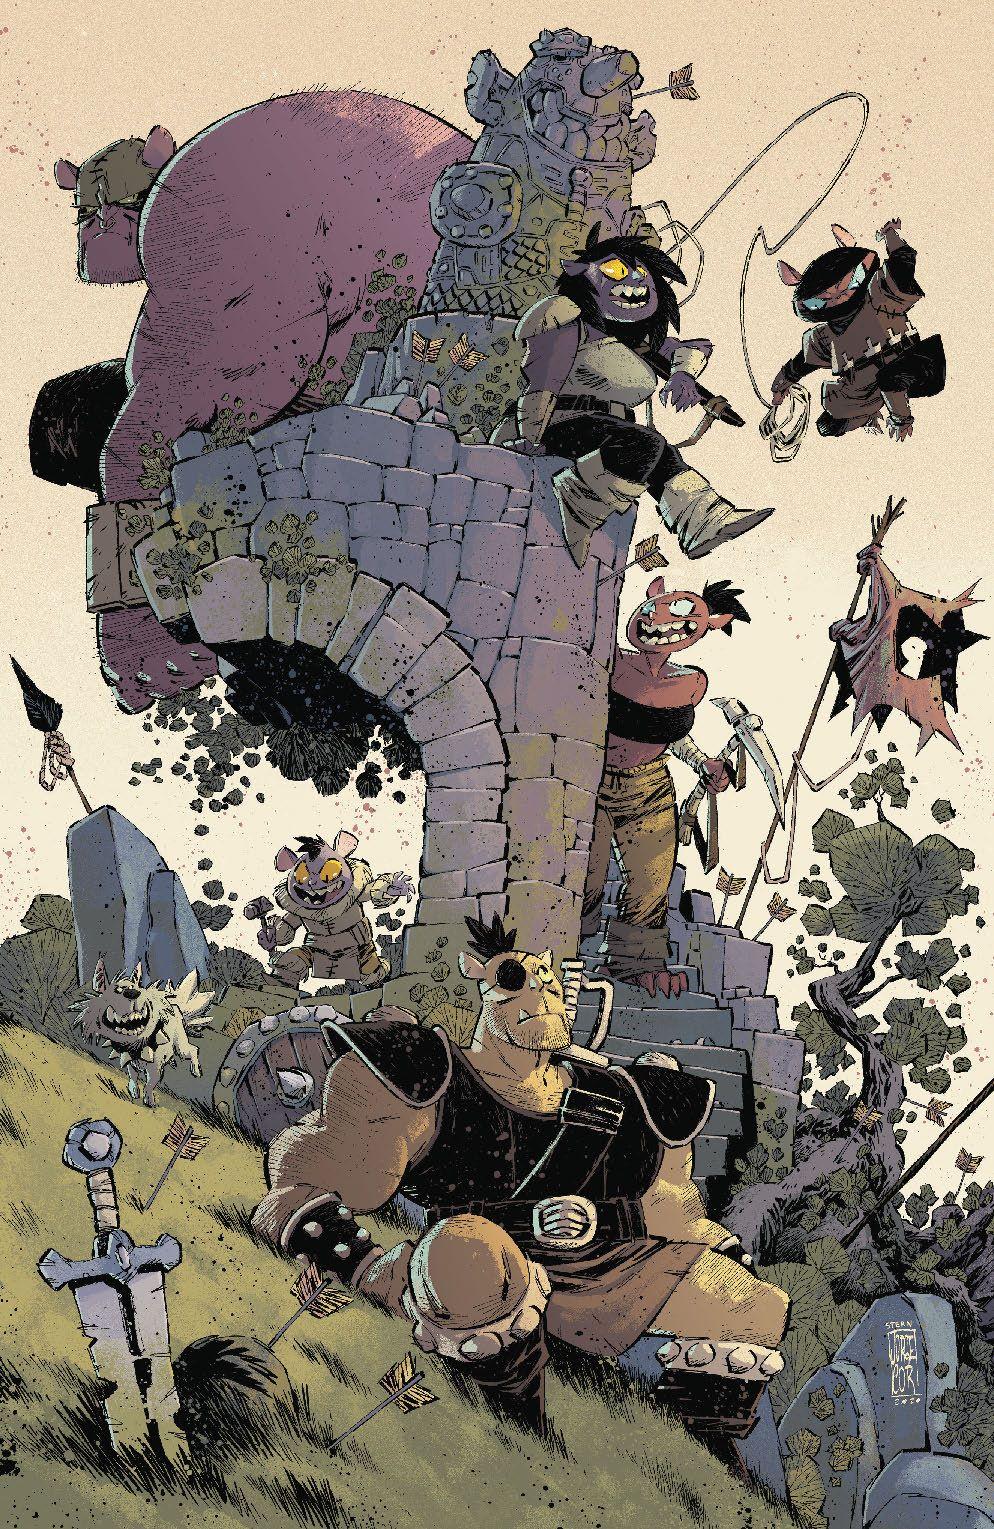 Orcs_004_Cover_C_Variant ComicList Previews: ORCS! #4 (OF 6)